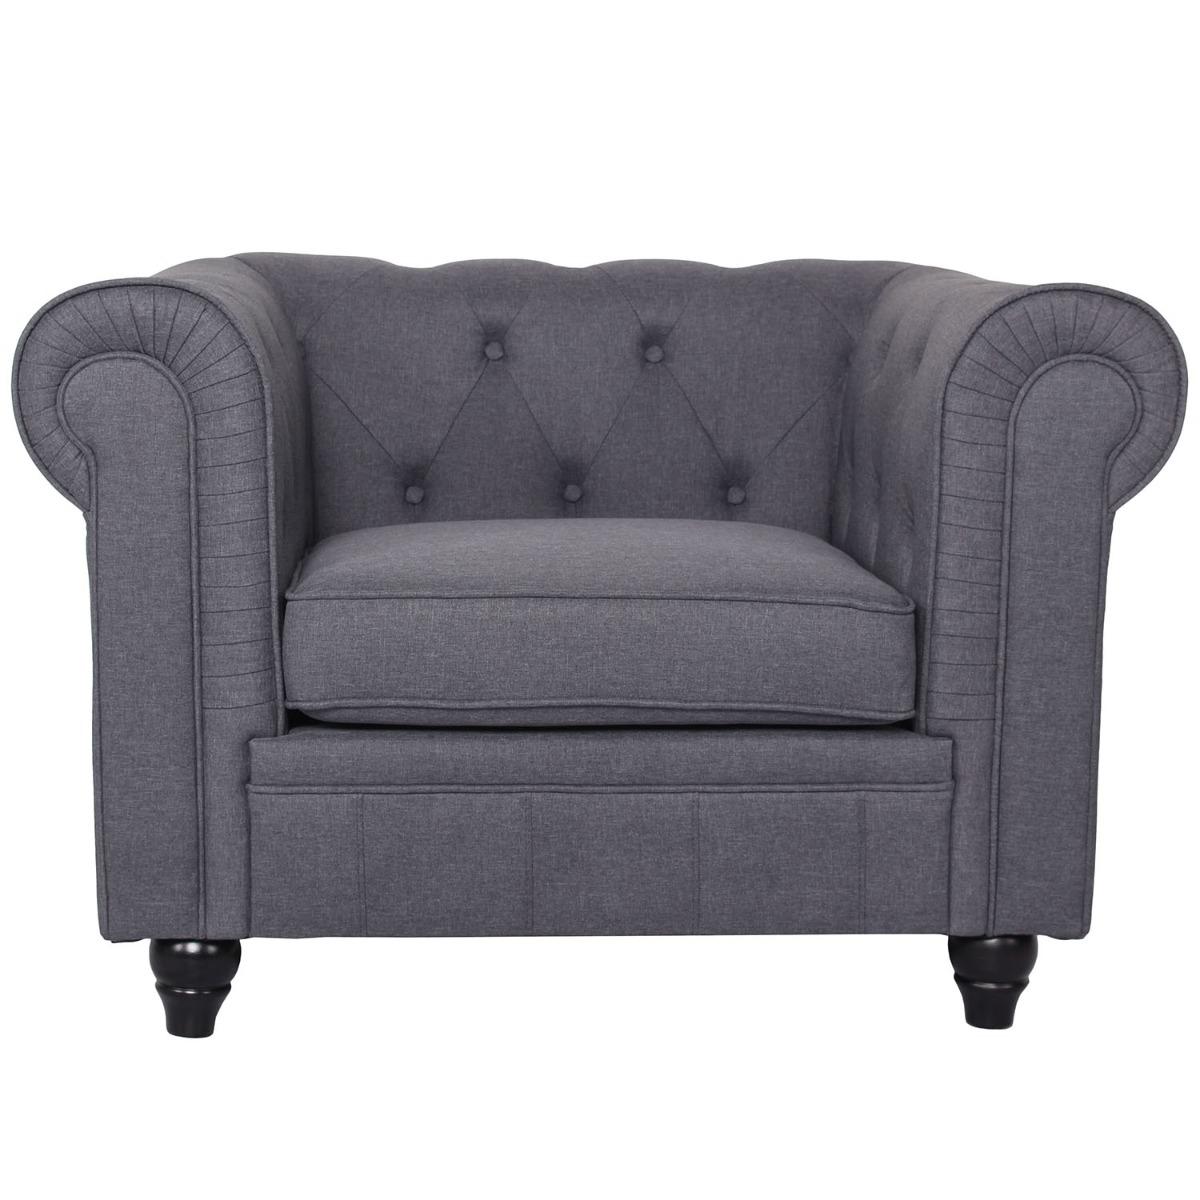 Grand fauteuil Chesterfield effet Lin Gris